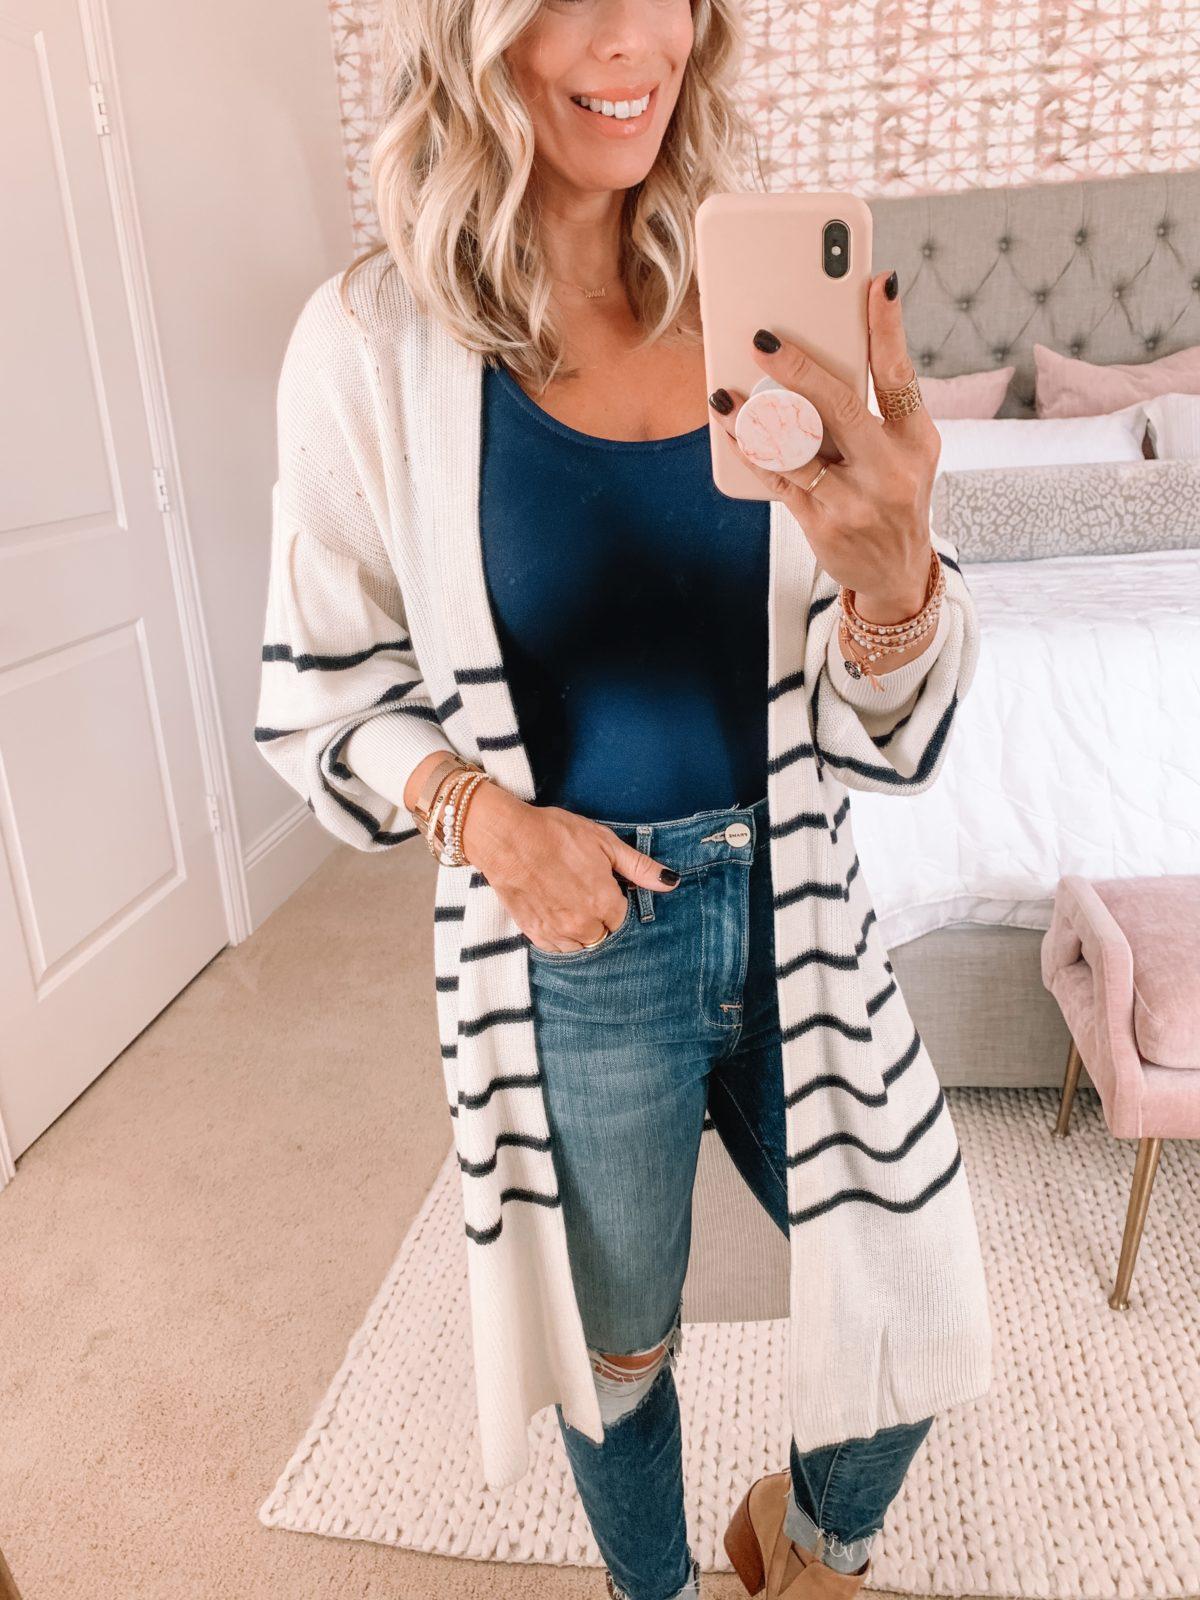 Dressing Room Finds, Express, Bodysuit, Cardigan, Distressed Jeans